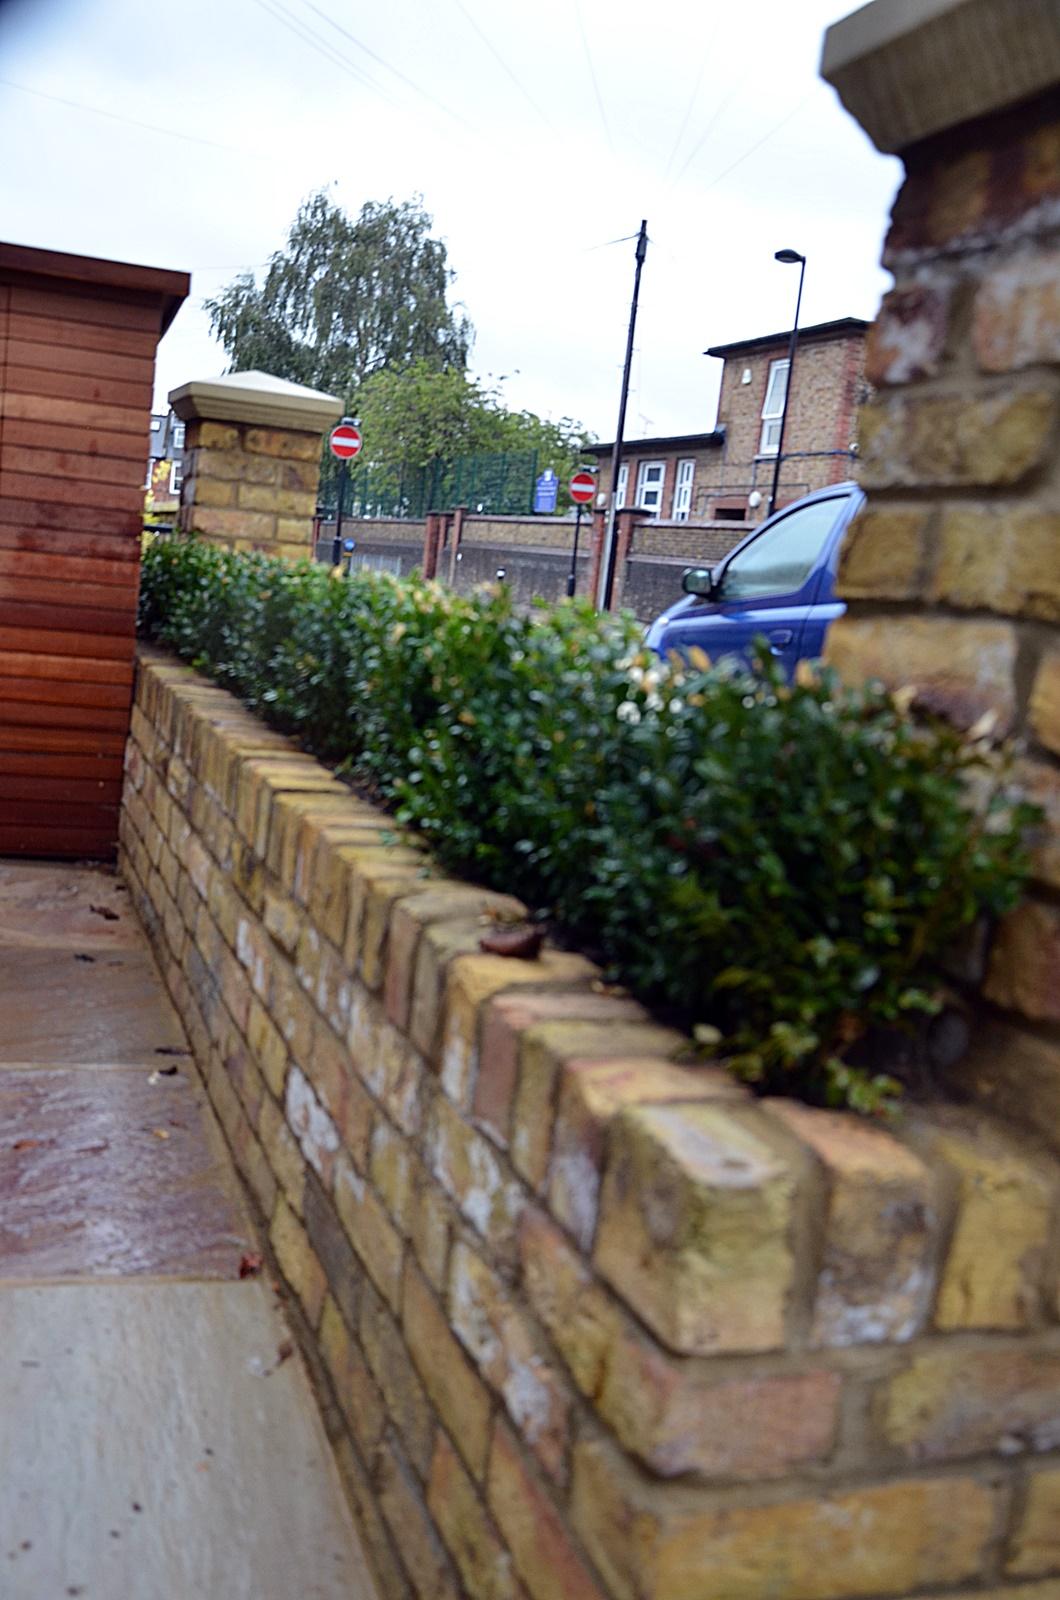 brick-garden-wall-planting-sandstone-paving-bespoke-storage-front-garden-london-fulham-chelsea-kensington